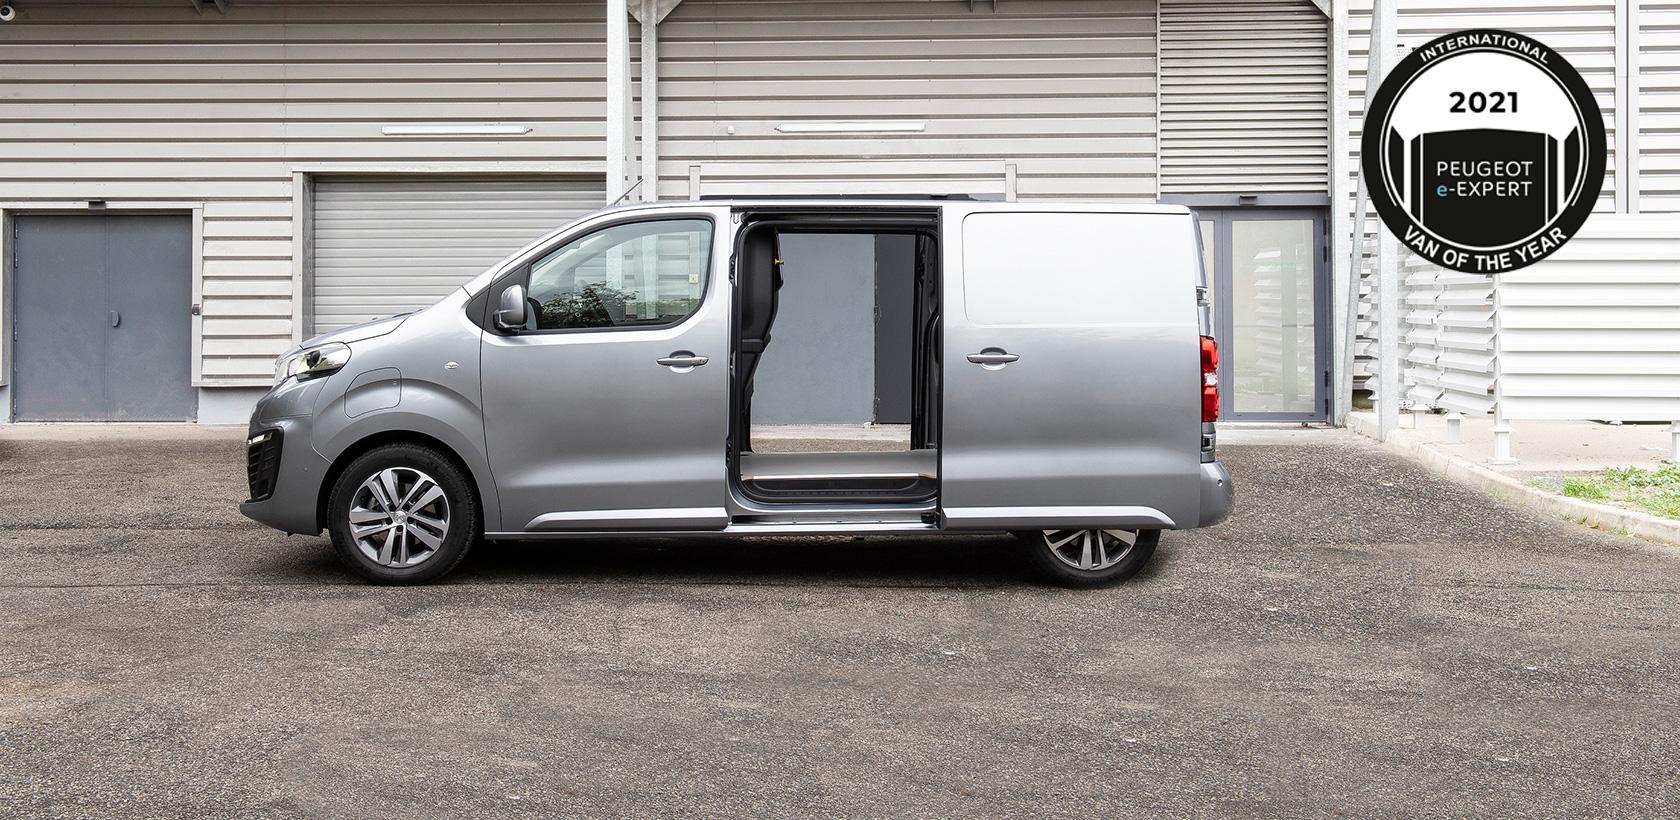 Nouveau Peugeot e-Expert, élu International Van Of The Year 2021